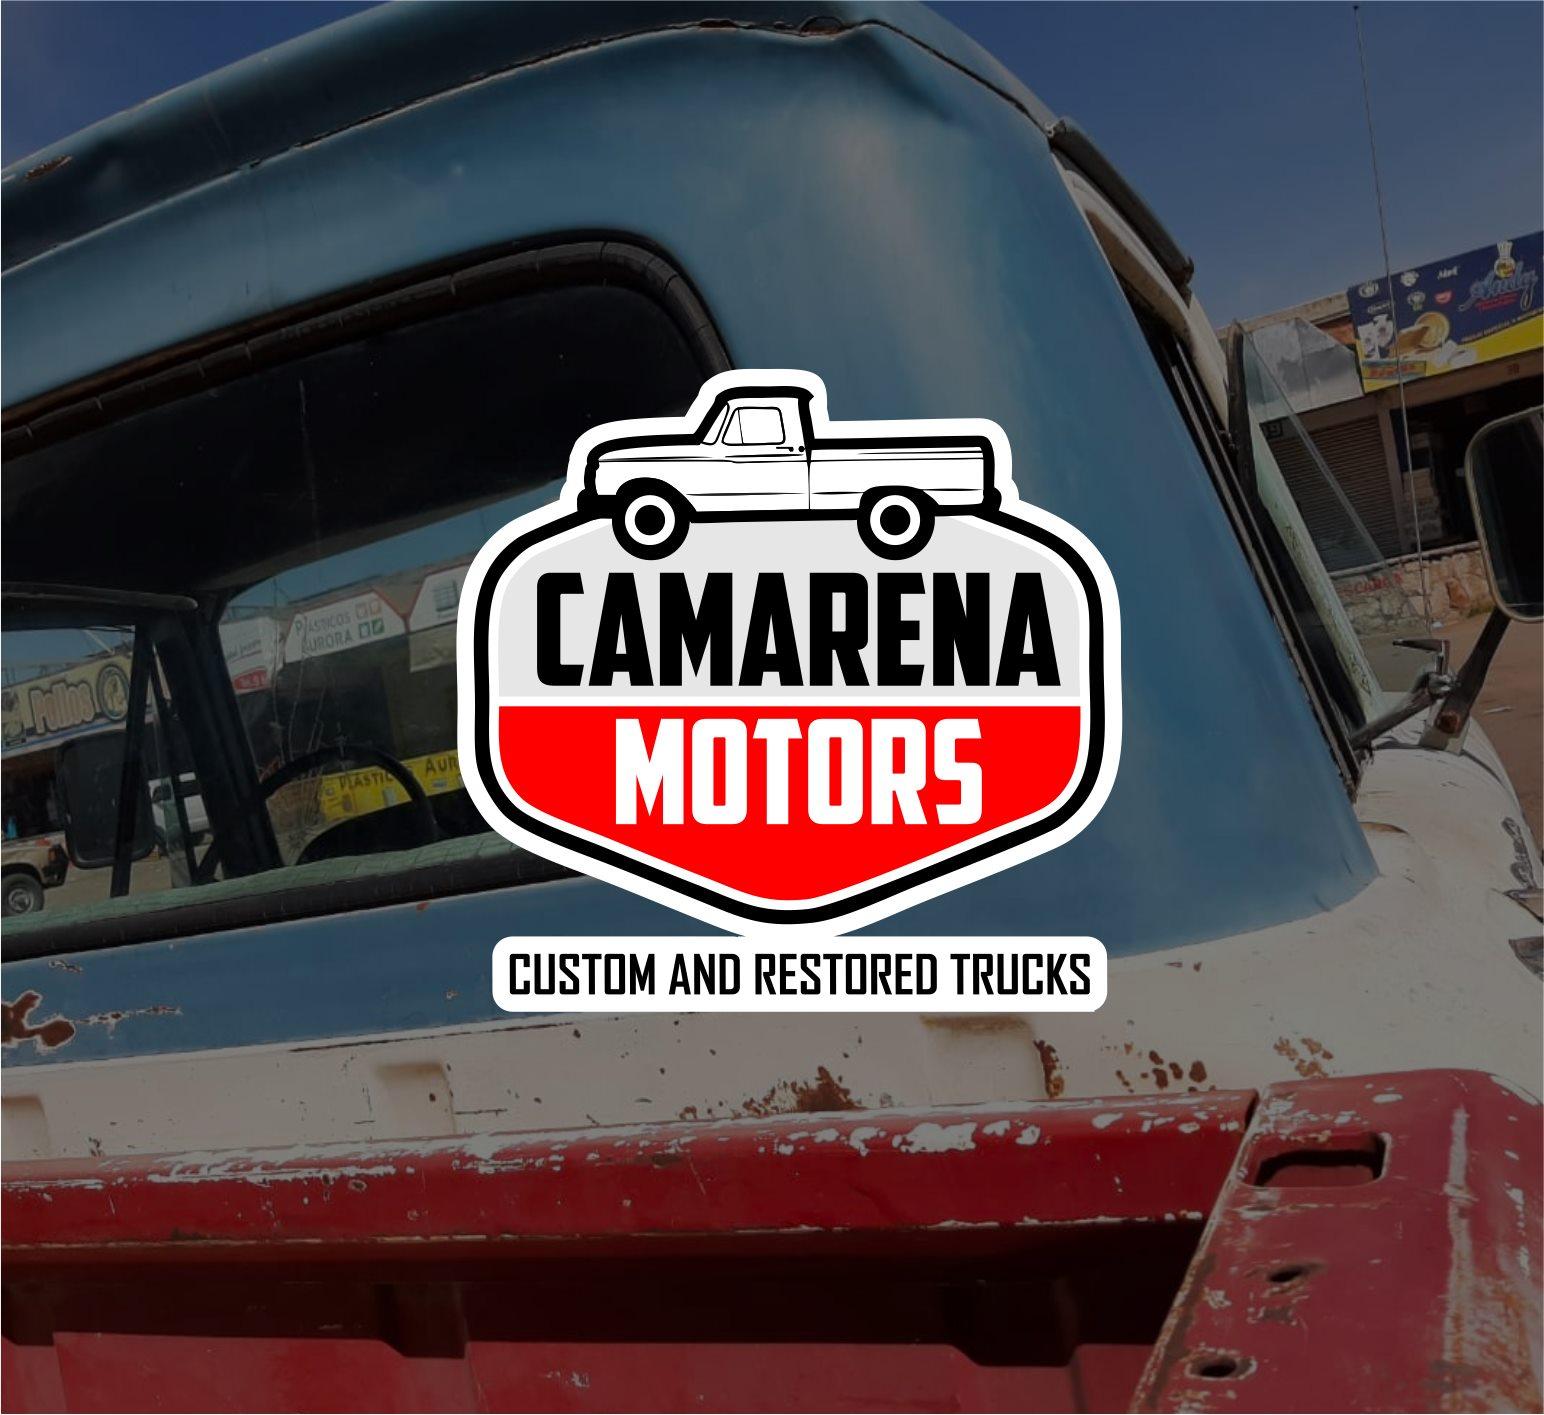 Camarena Motors